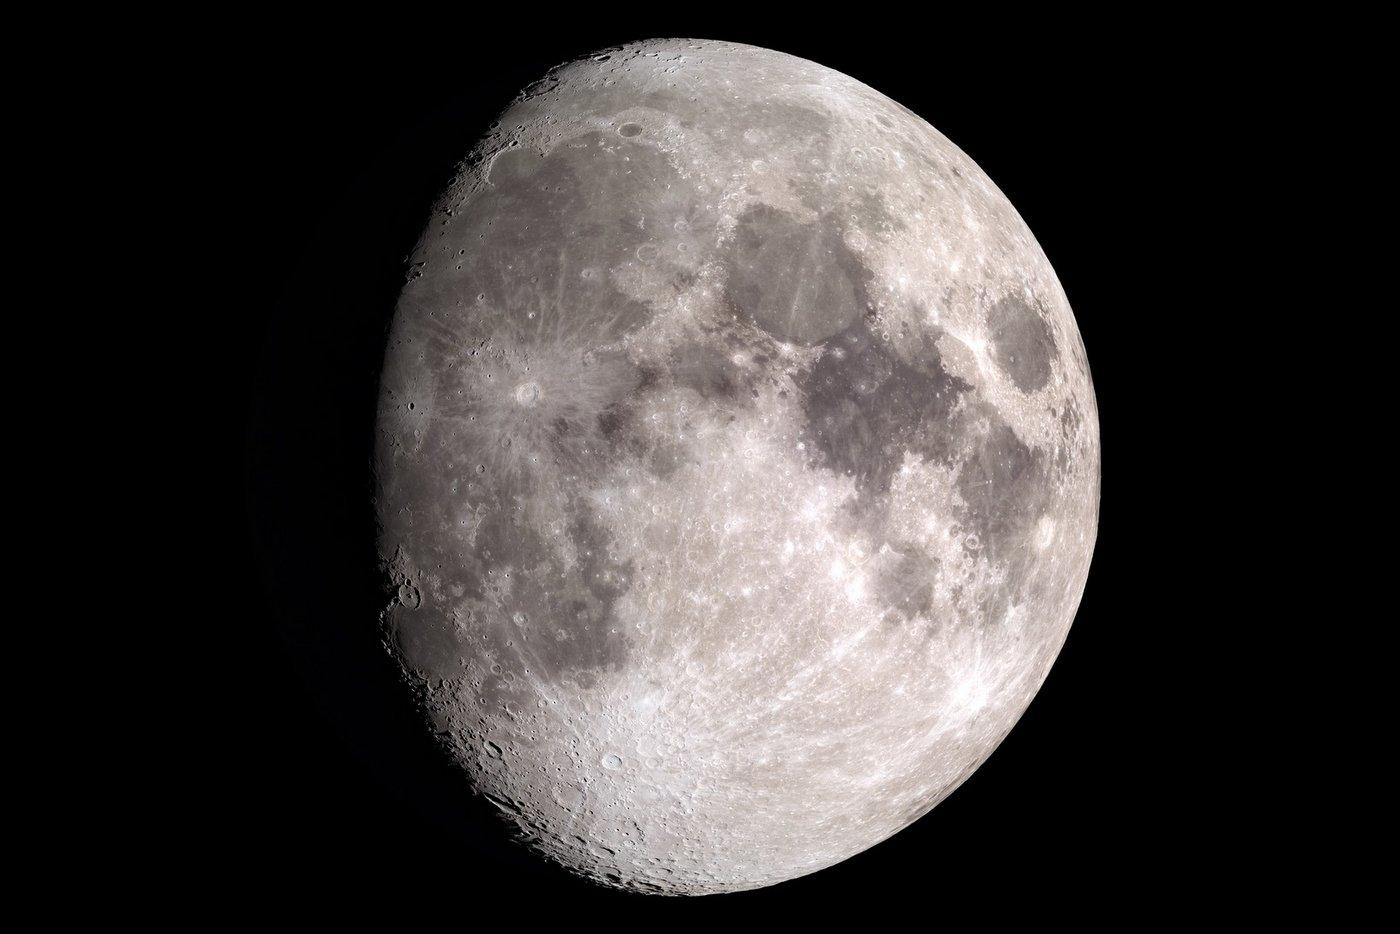 The moon - Photo by NASA - Ernie Wright